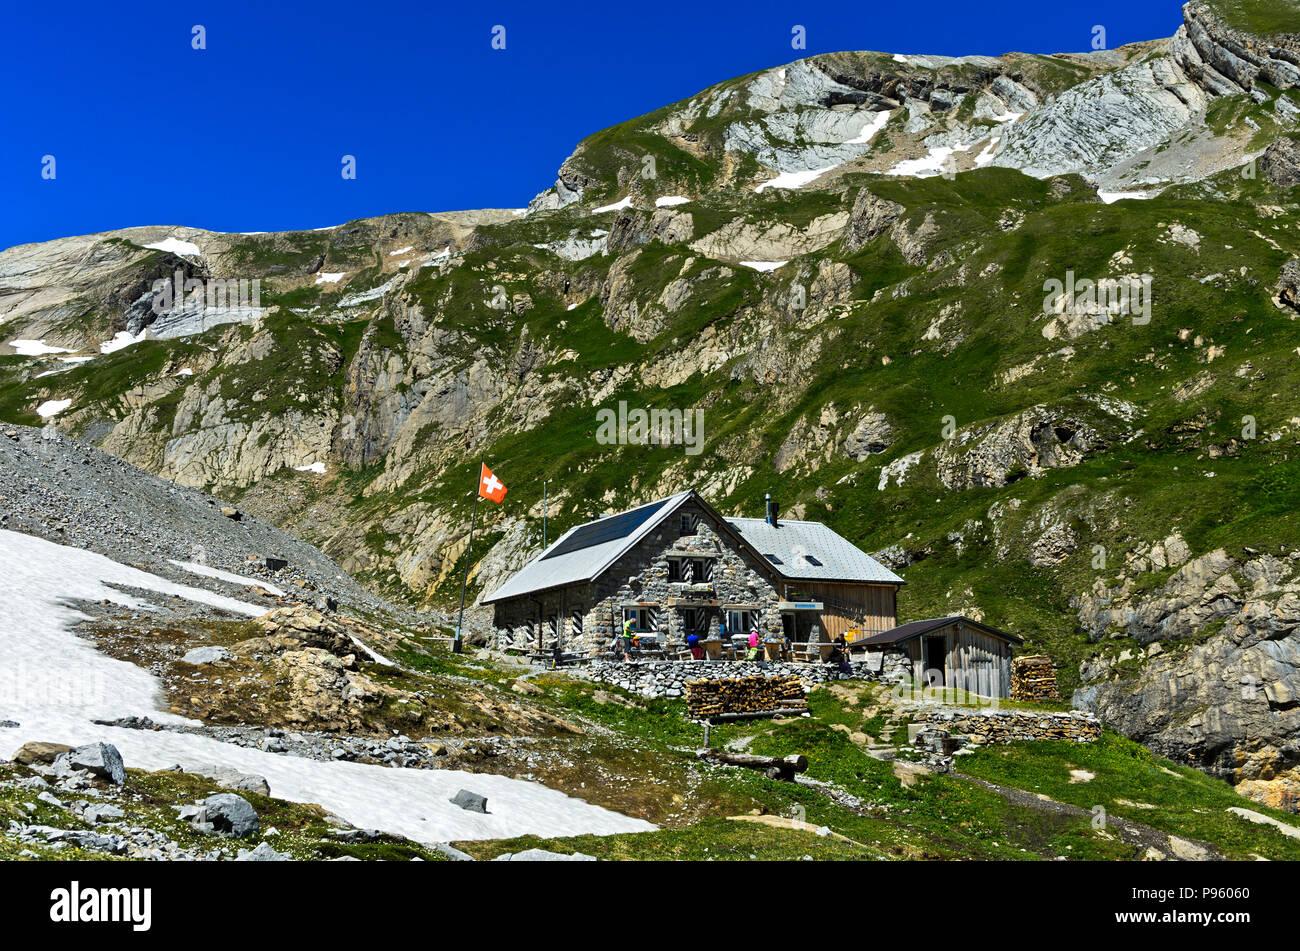 Mountain hut Wildhornhütte of the Swiss Alpin Club, Bernese Alps, Lenk, Switzerland - Stock Image